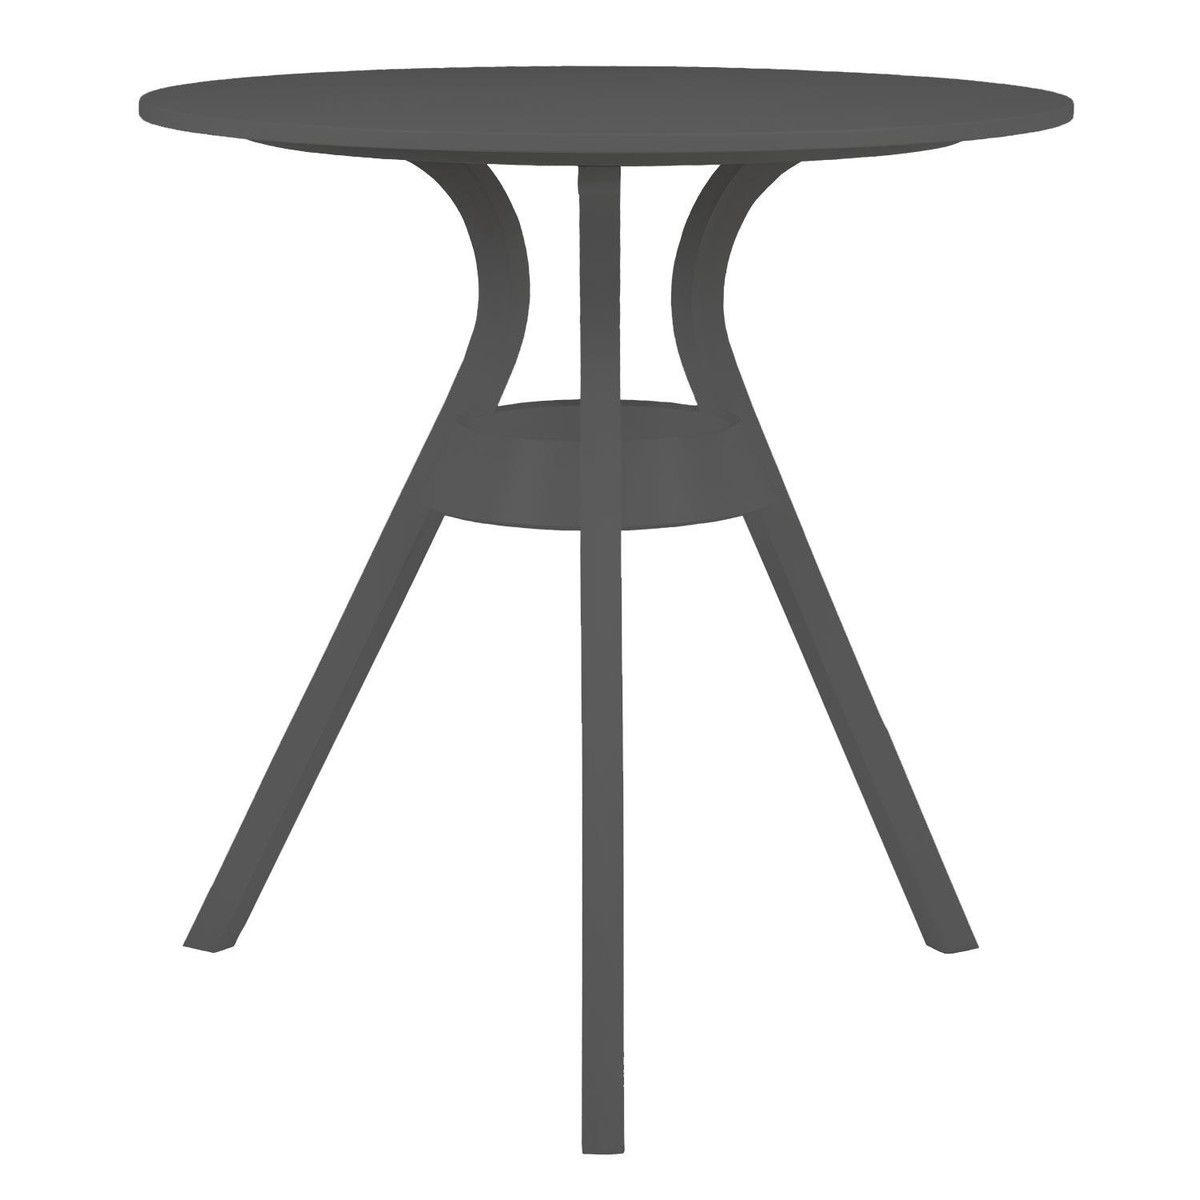 thonet 1403 bistrotisch 60cm thonet. Black Bedroom Furniture Sets. Home Design Ideas